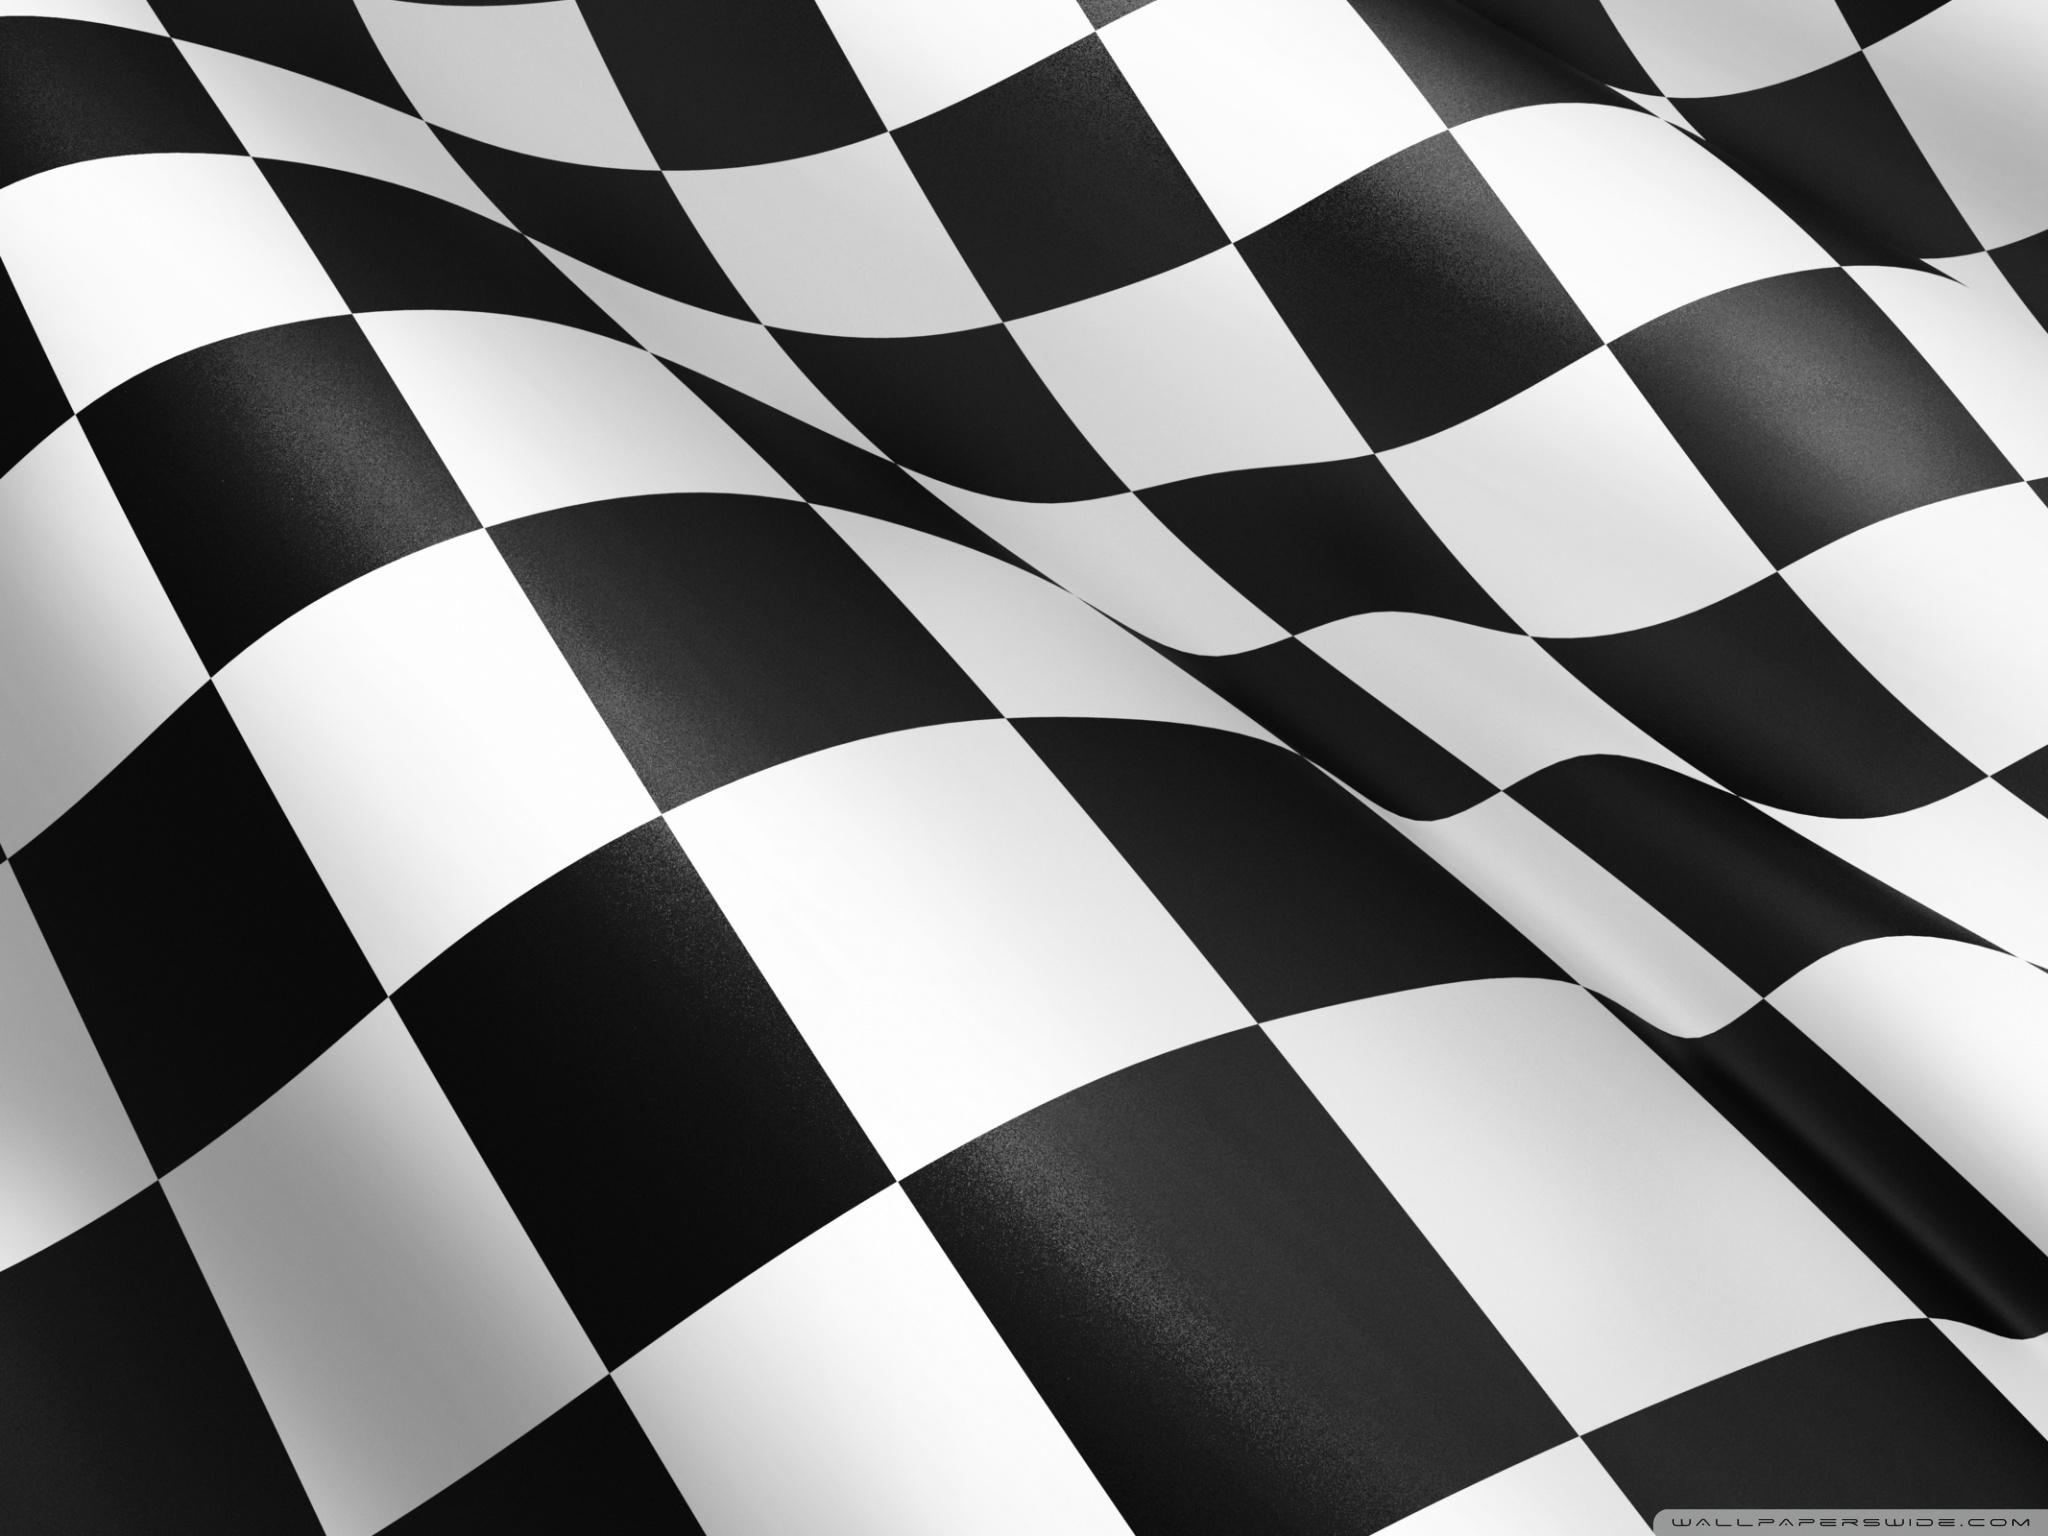 Racing Flag 4K HD Desktop Wallpaper for 4K Ultra HD TV Dual 2048x1536